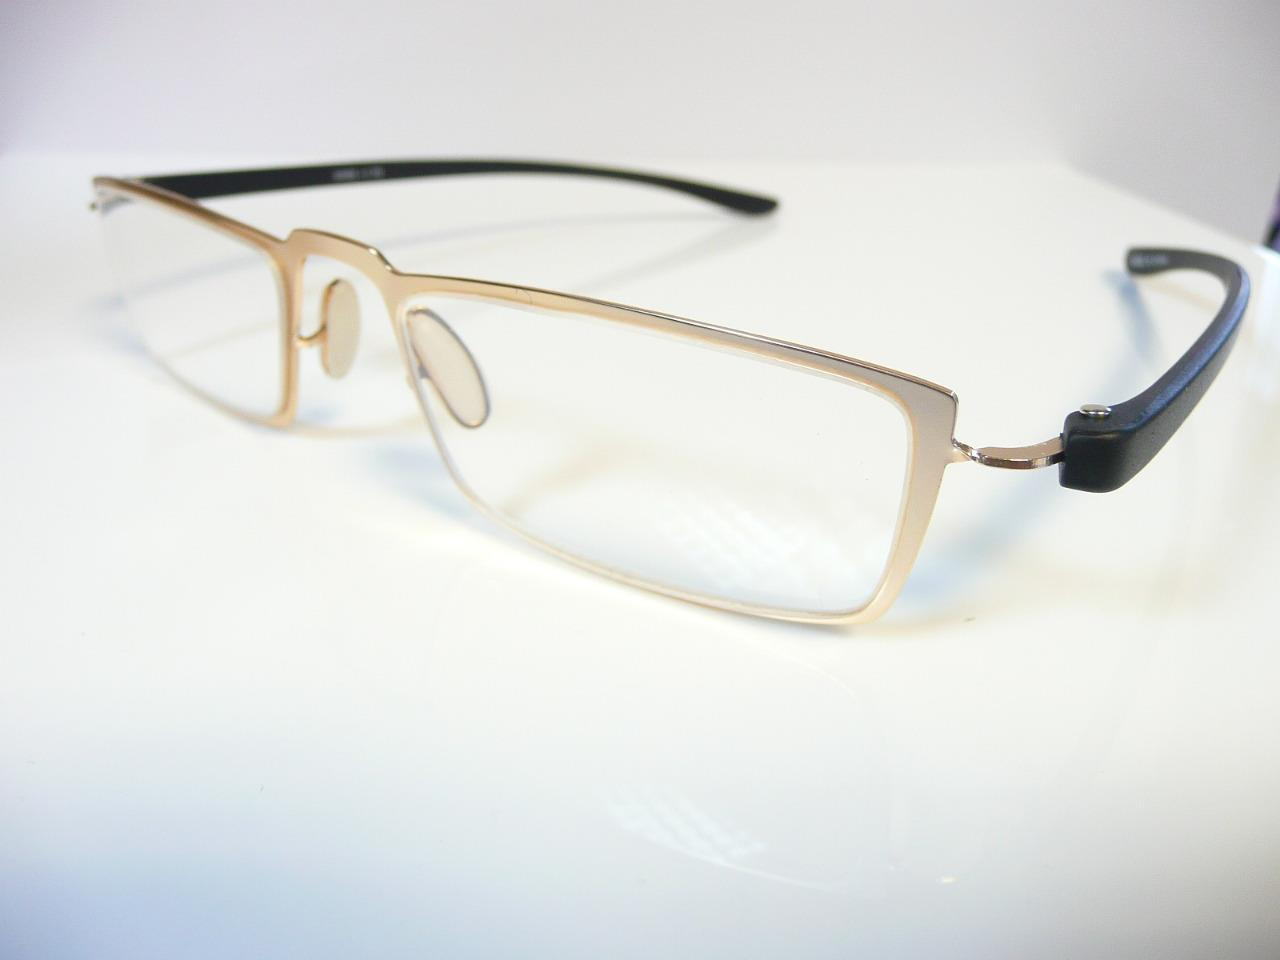 new mens metal reading glasses 1 1 25 1 5 1 75 2 2 25 2